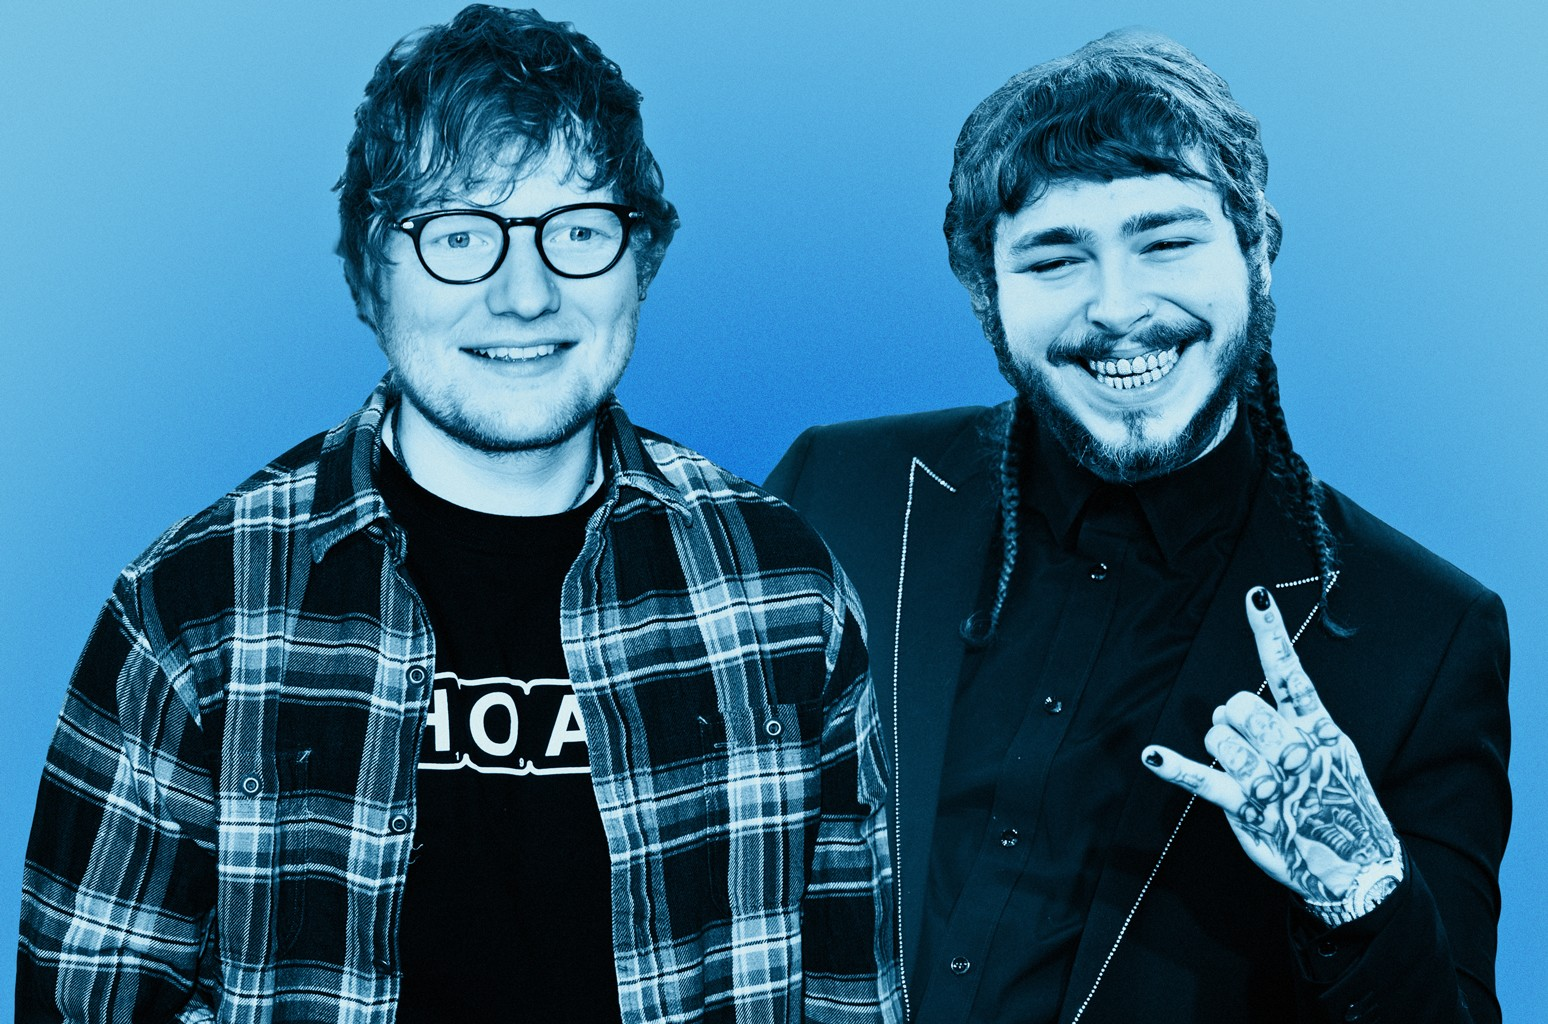 Ed Sheeran (left) & Post Malone